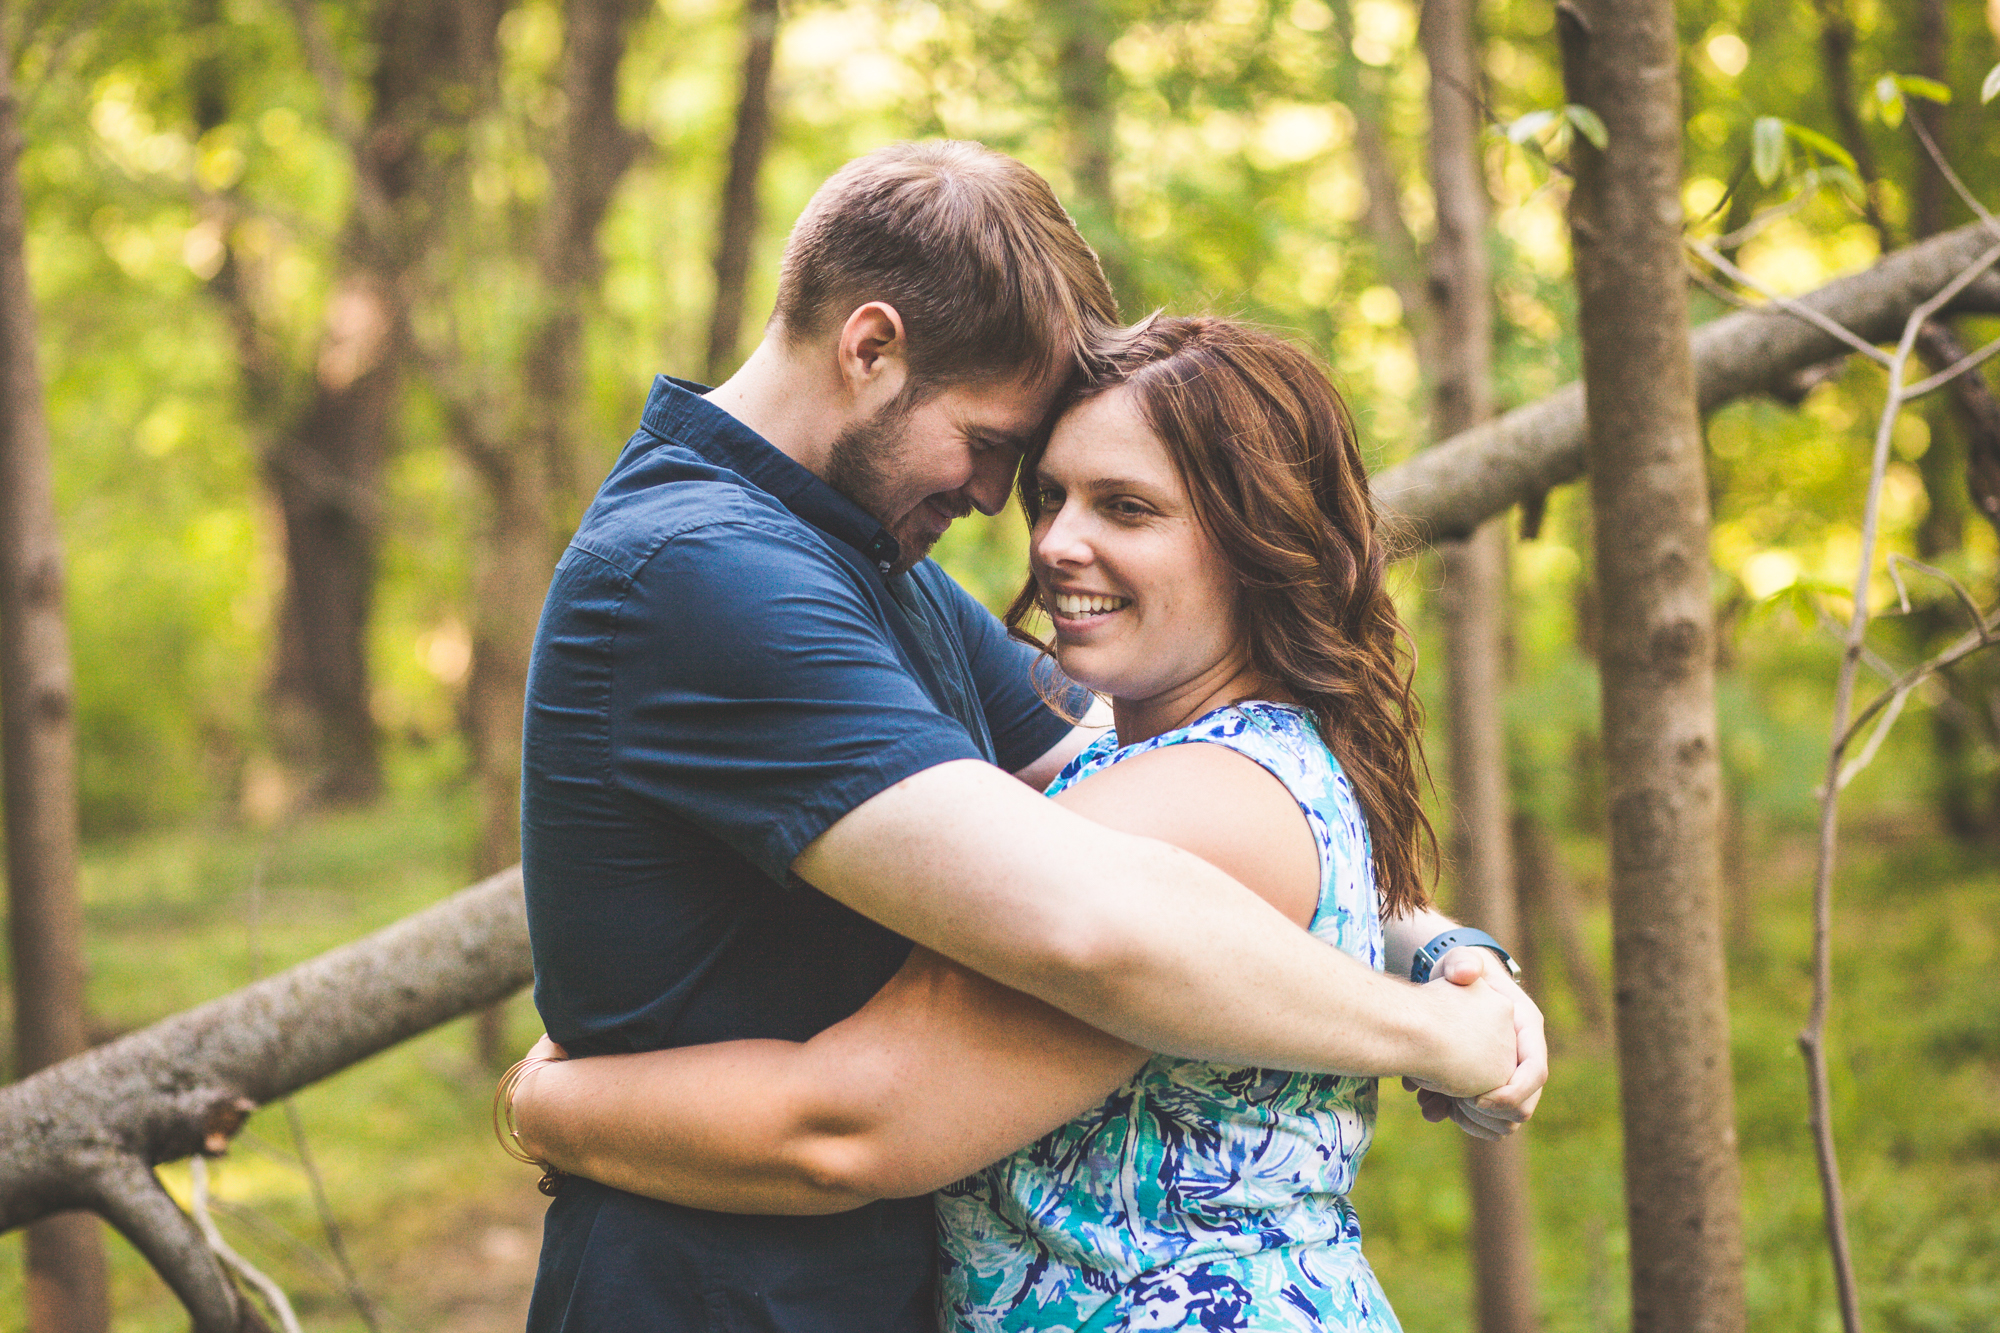 20180507-BridgetAdam-Engagement-blog-17.jpg